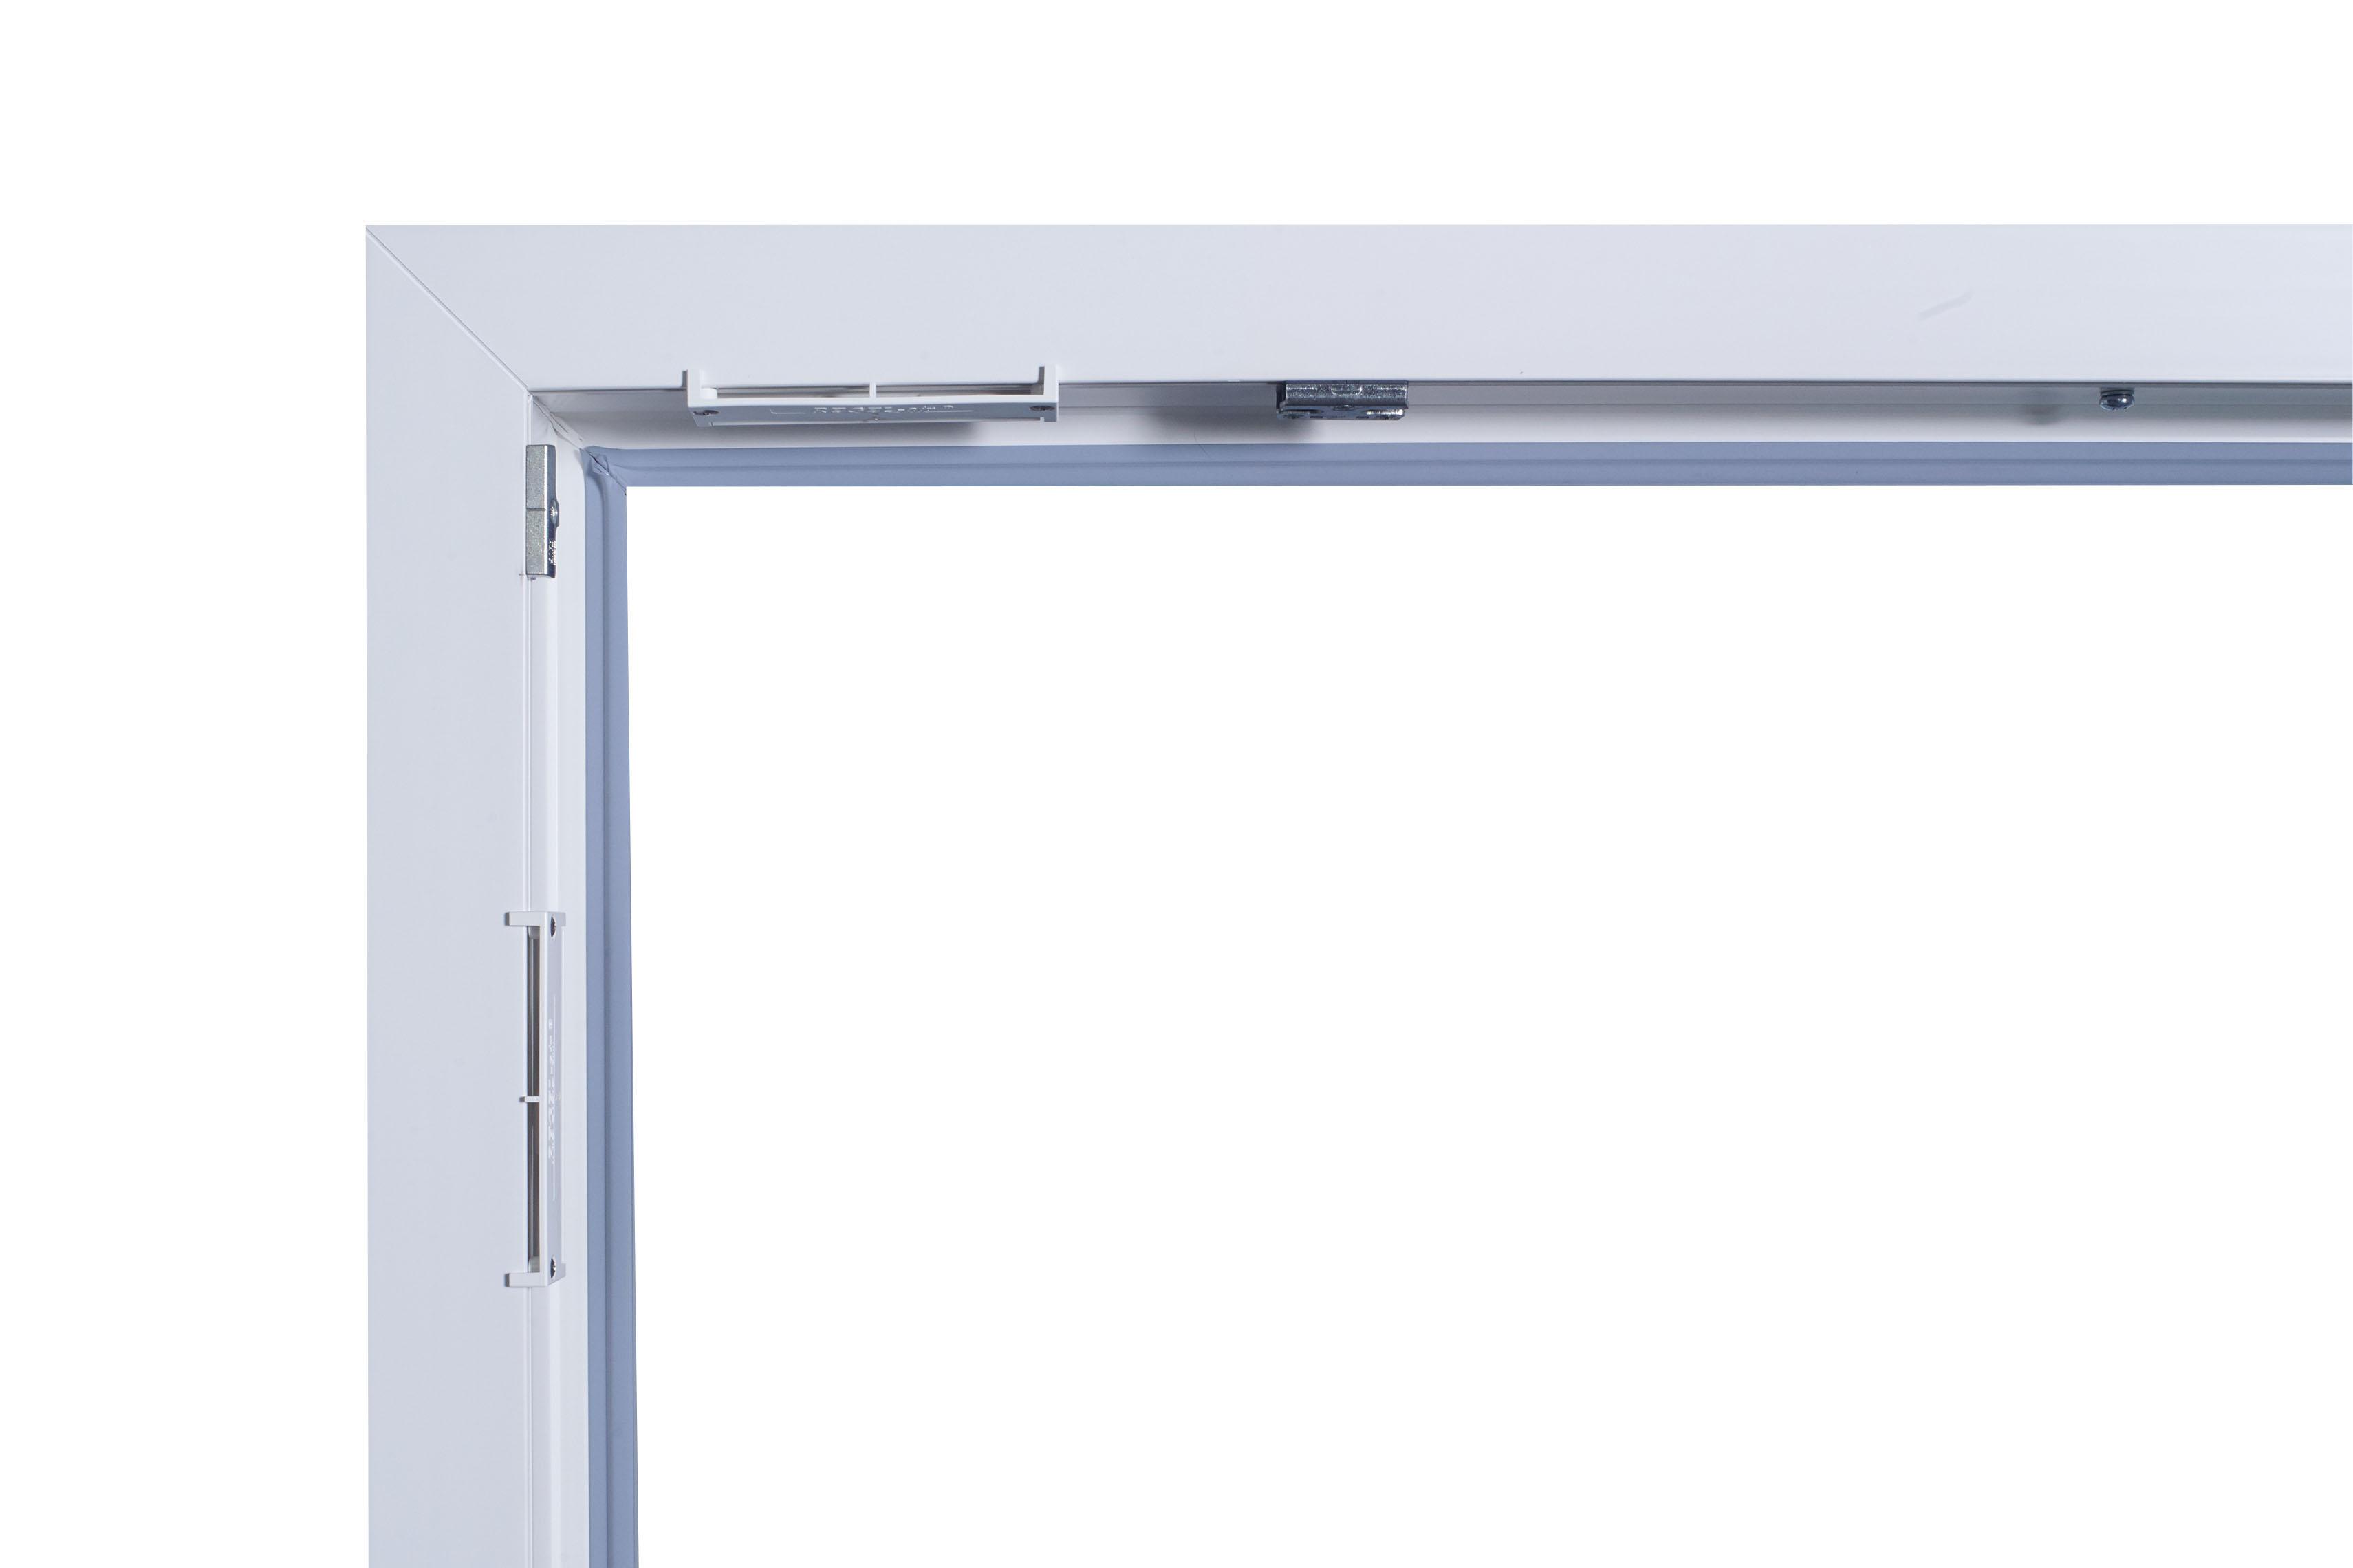 Favorit Fensterfalzlüfter FFL17 Kunststofffenster | Regel-air® ZU53